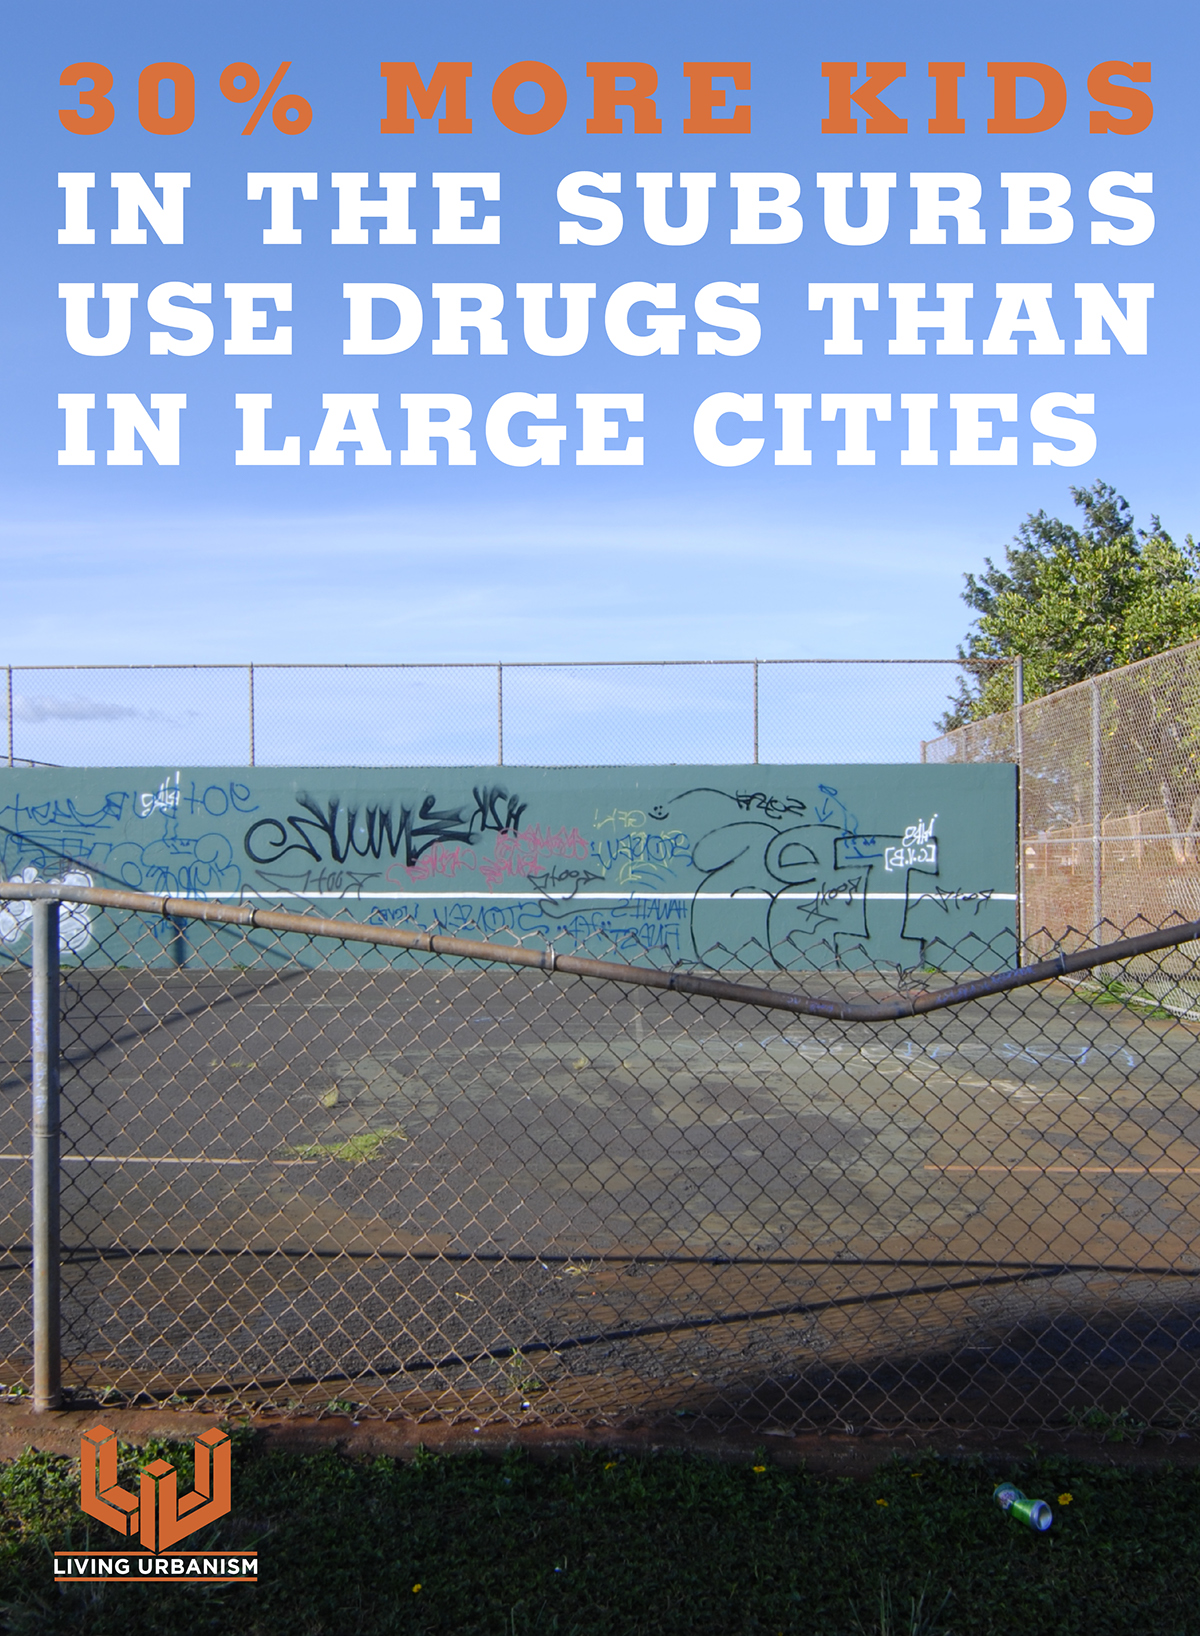 mfa thesis living urbanism urbanism   Urban community publication Creative Direction  UI/UX Packaging